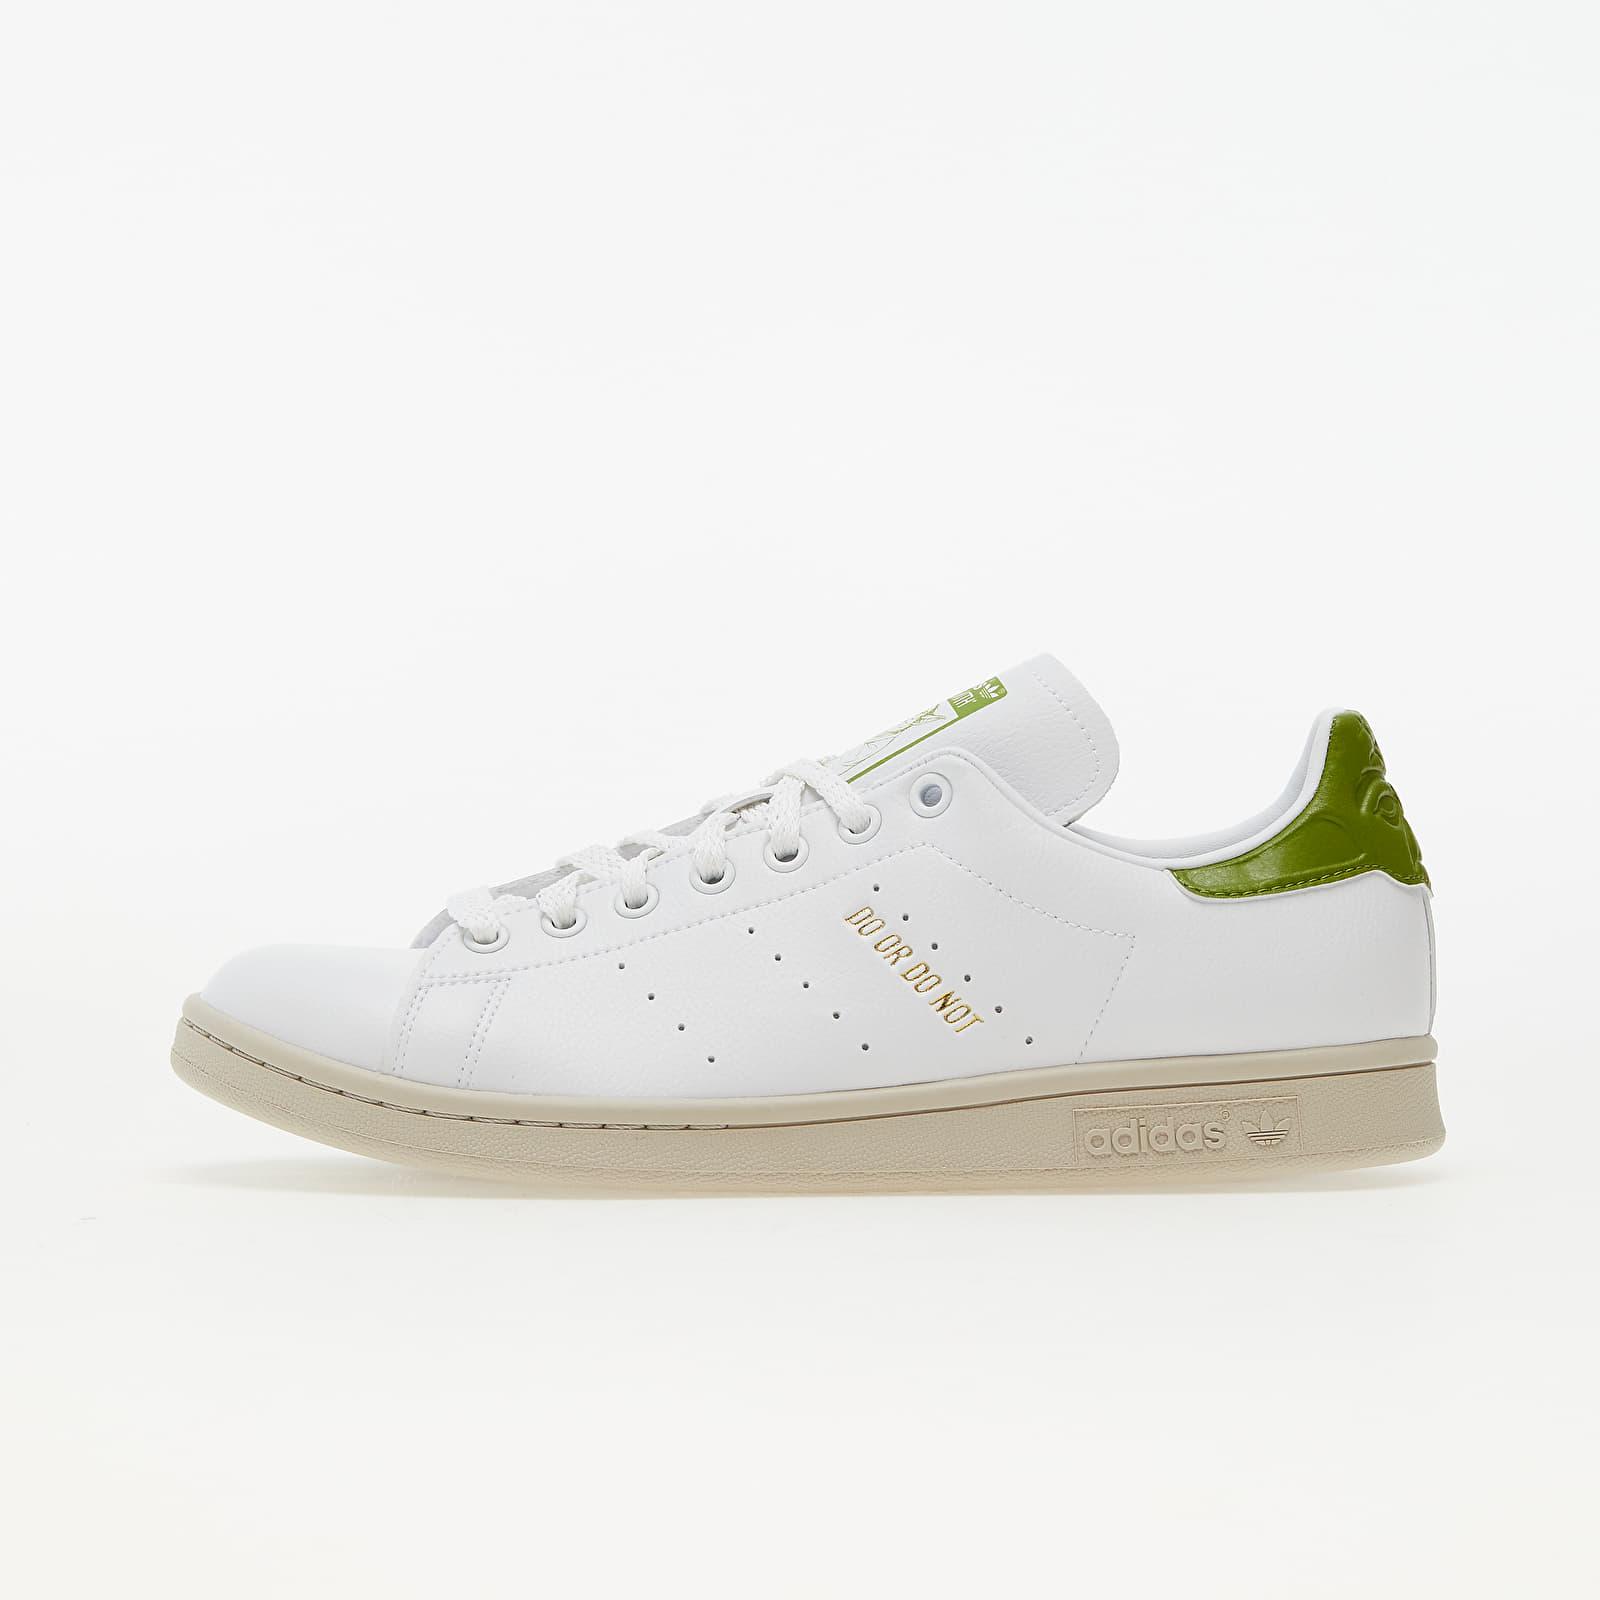 adidas Stan Smith Star Wars Ftw White/ Phanton/ Core Brown FY5463